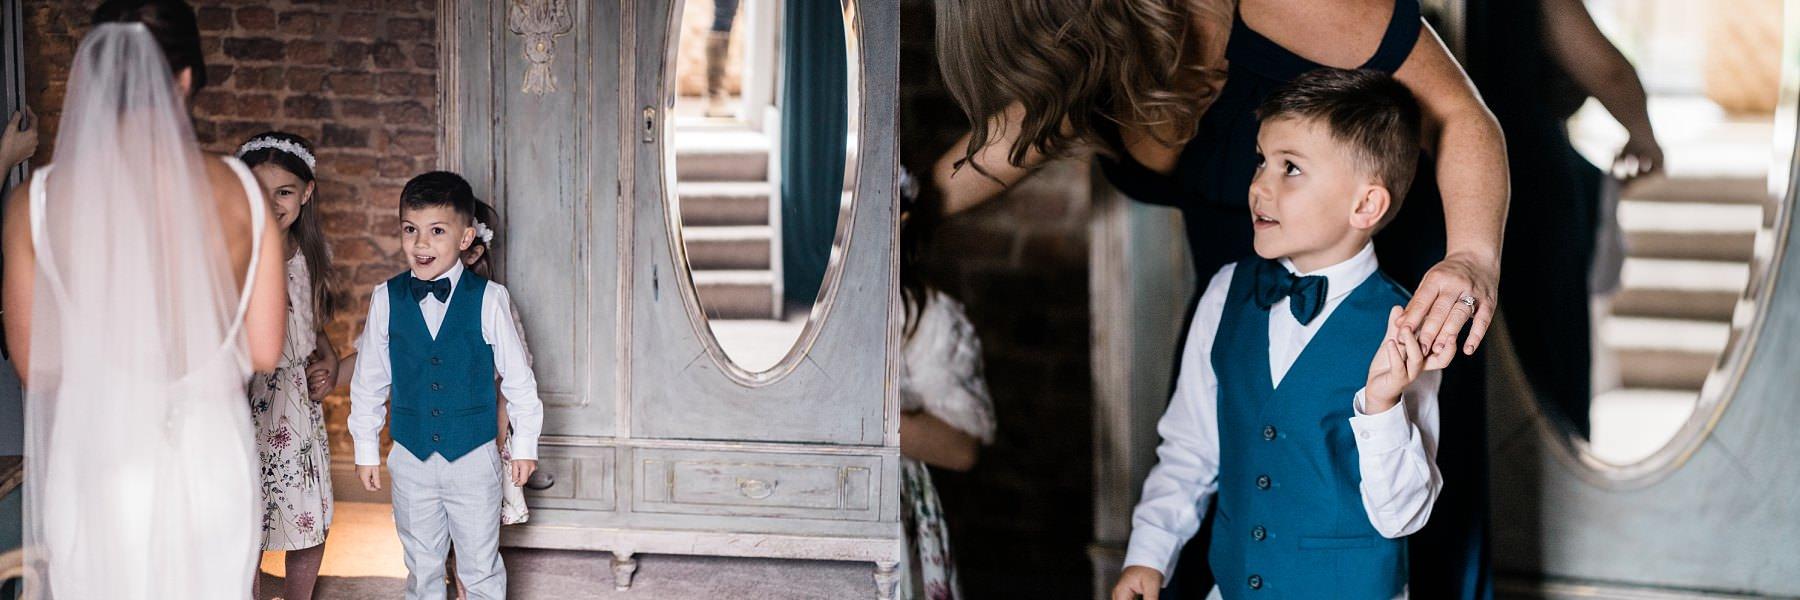 Bridal preparations Le petite Chateau wedding - North East Wedding Photographer